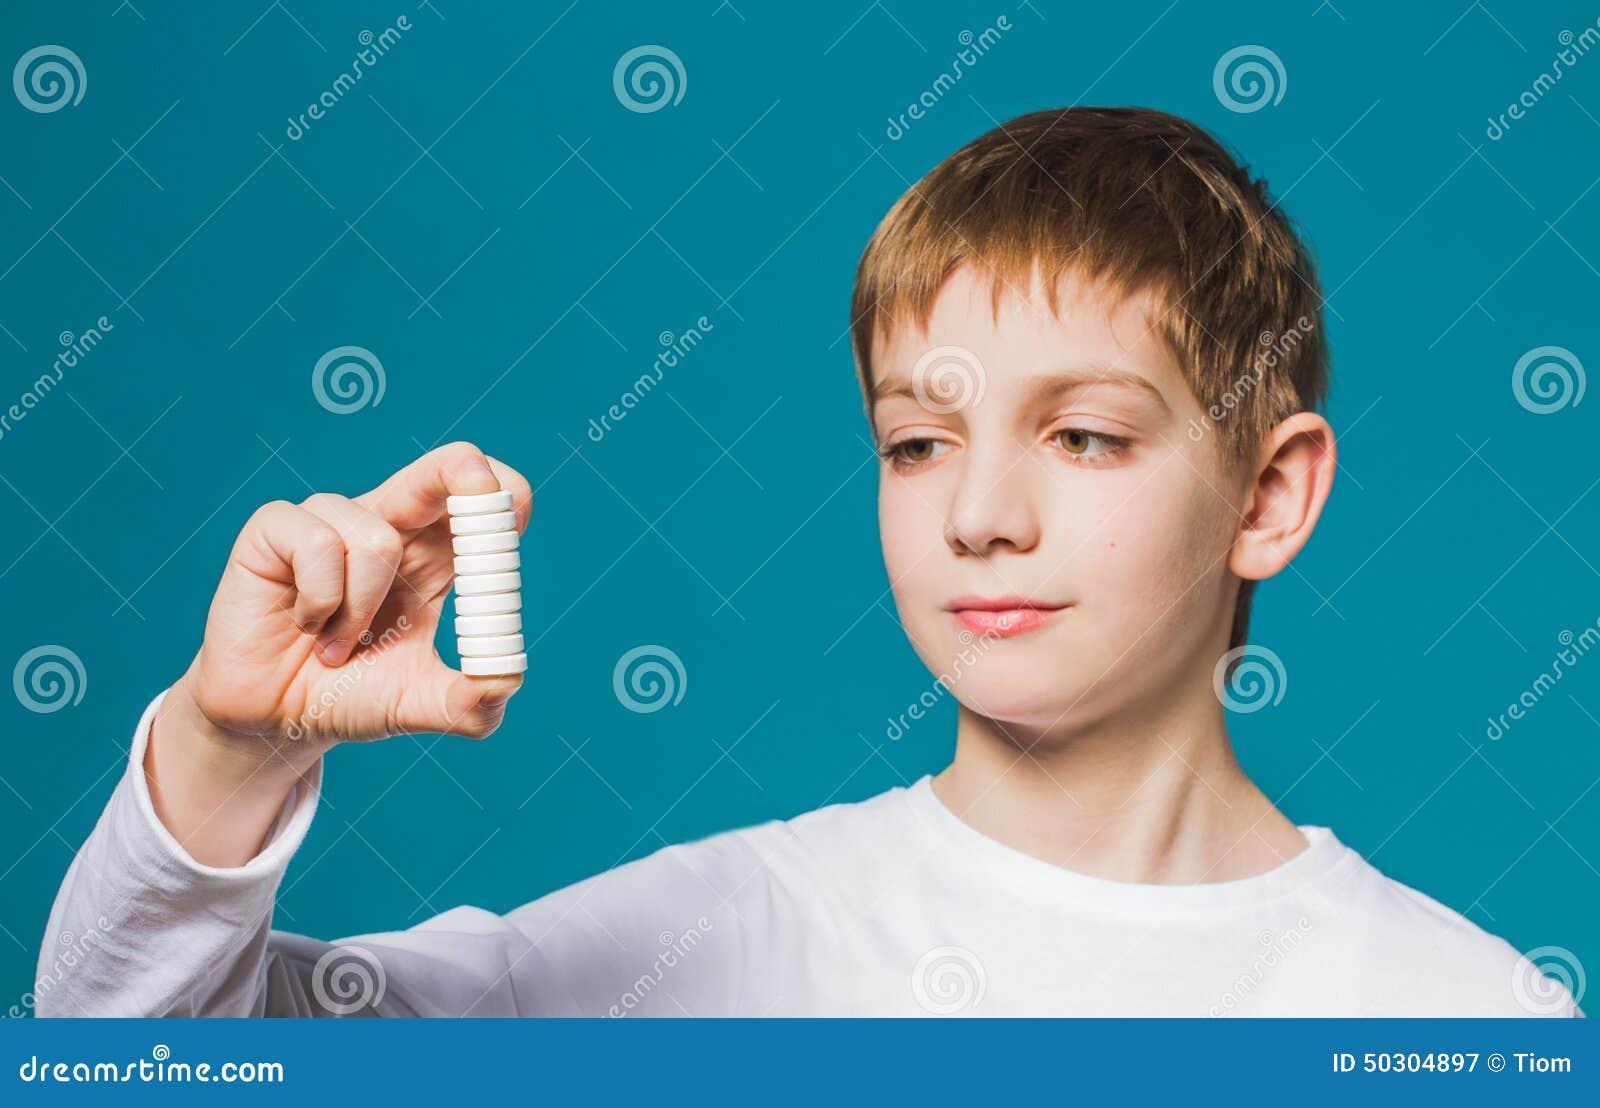 Little Boy Holding Pills Royalty-Free Stock Image ...